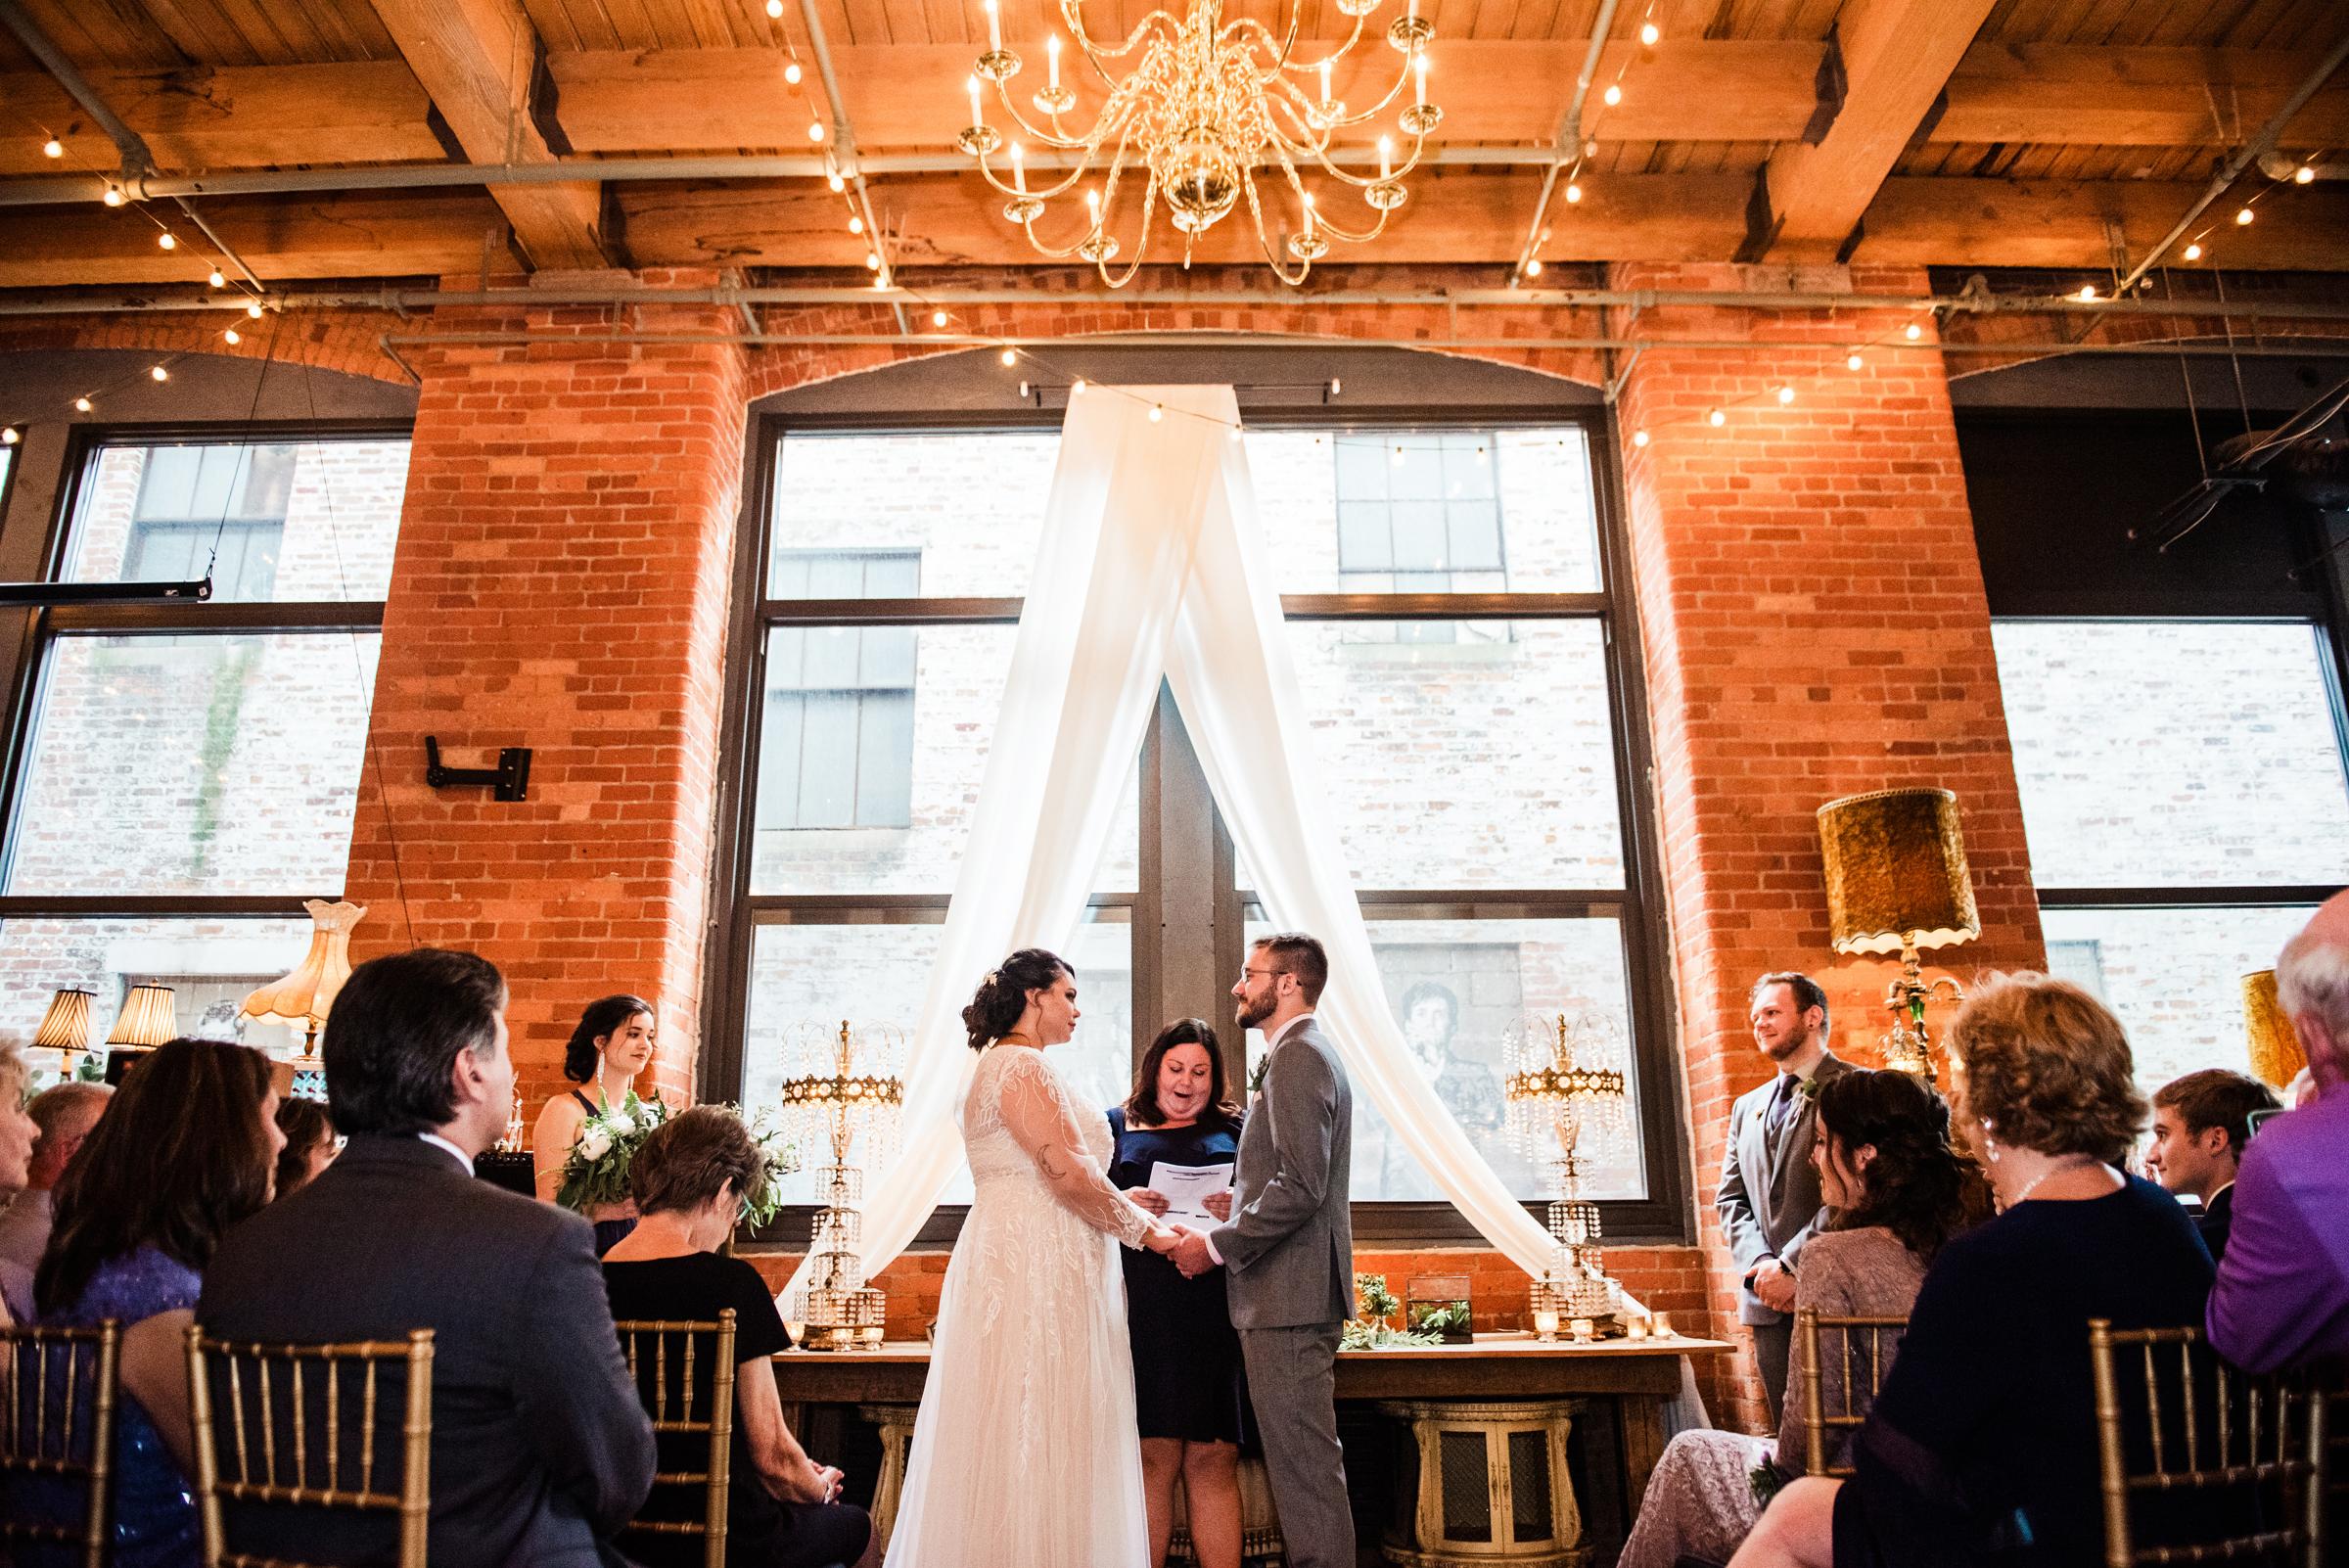 Studio_180_Lamberton_Conservatory_Rochester_Wedding_JILL_STUDIO_Rochester_NY_Photographer_DSC_8945.jpg